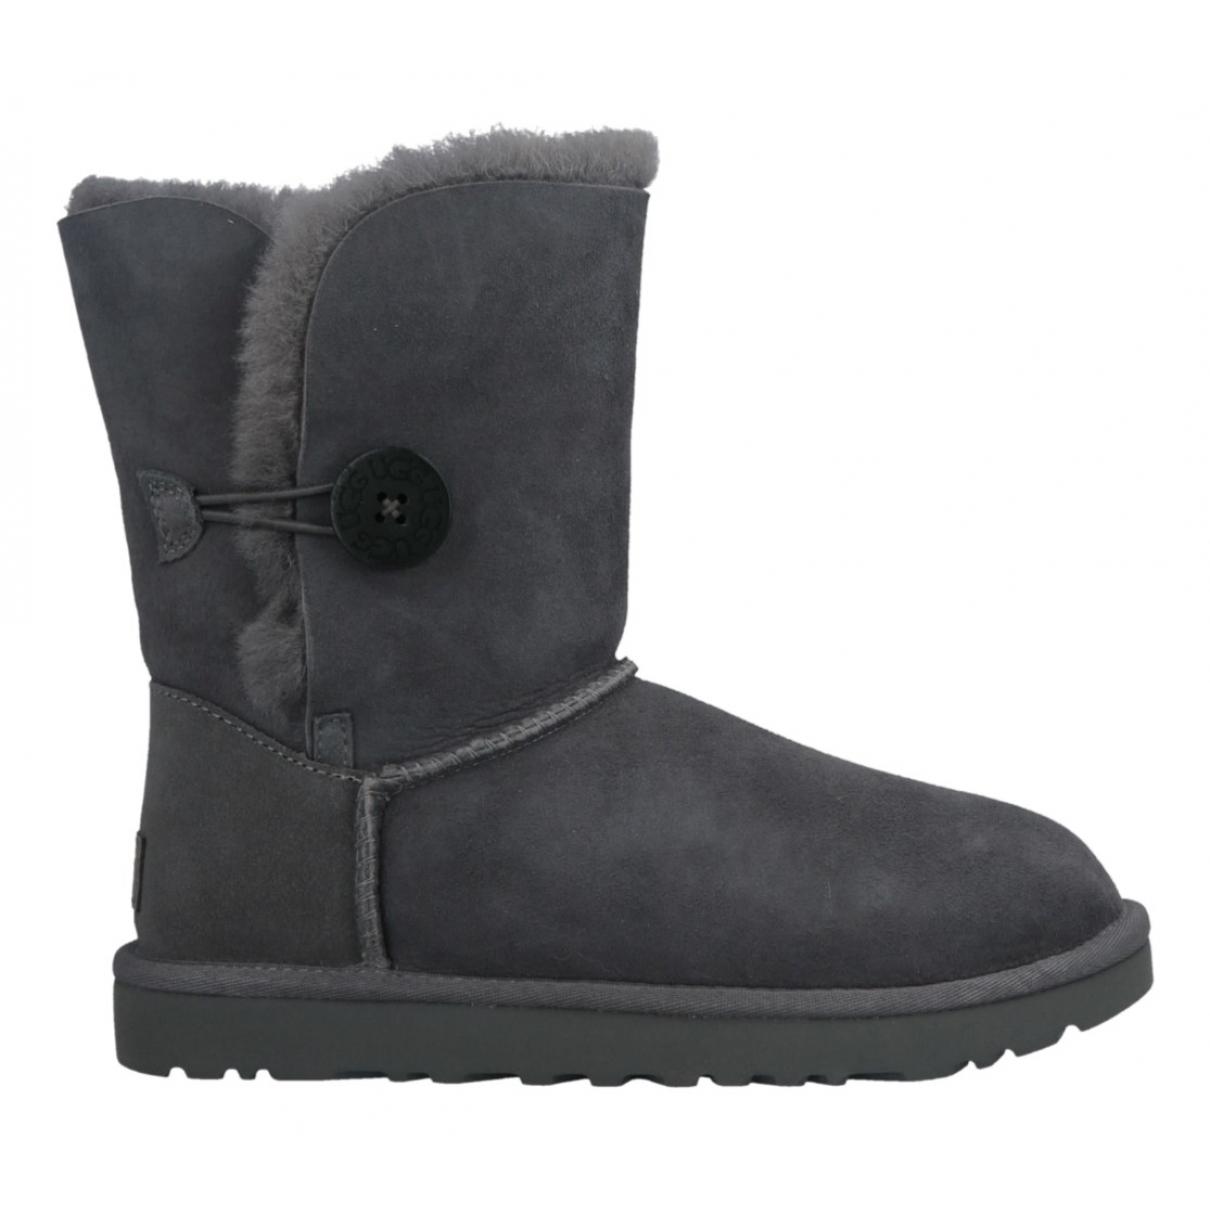 Ugg - Boots   pour femme en suede - anthracite